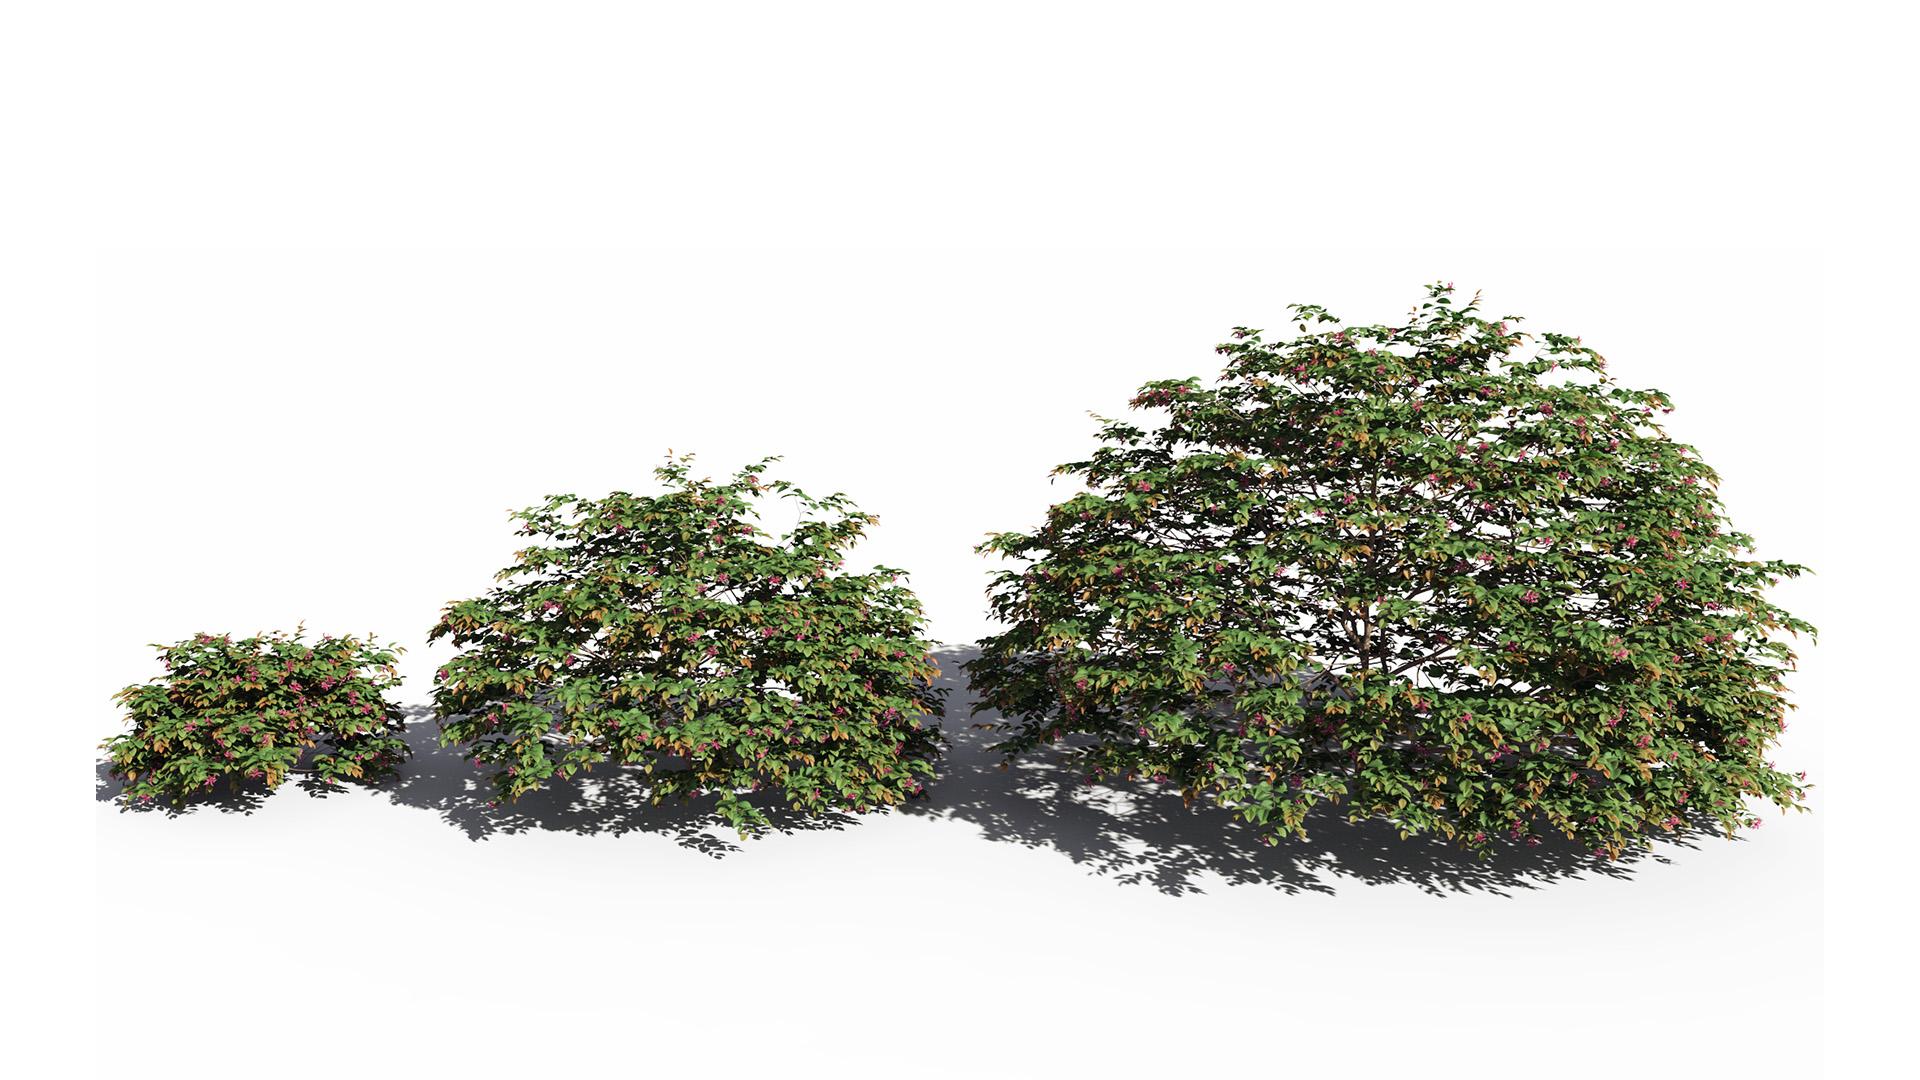 3D model of the Chinese fringe flower Loropetalum chinense var rubrum maturity variations